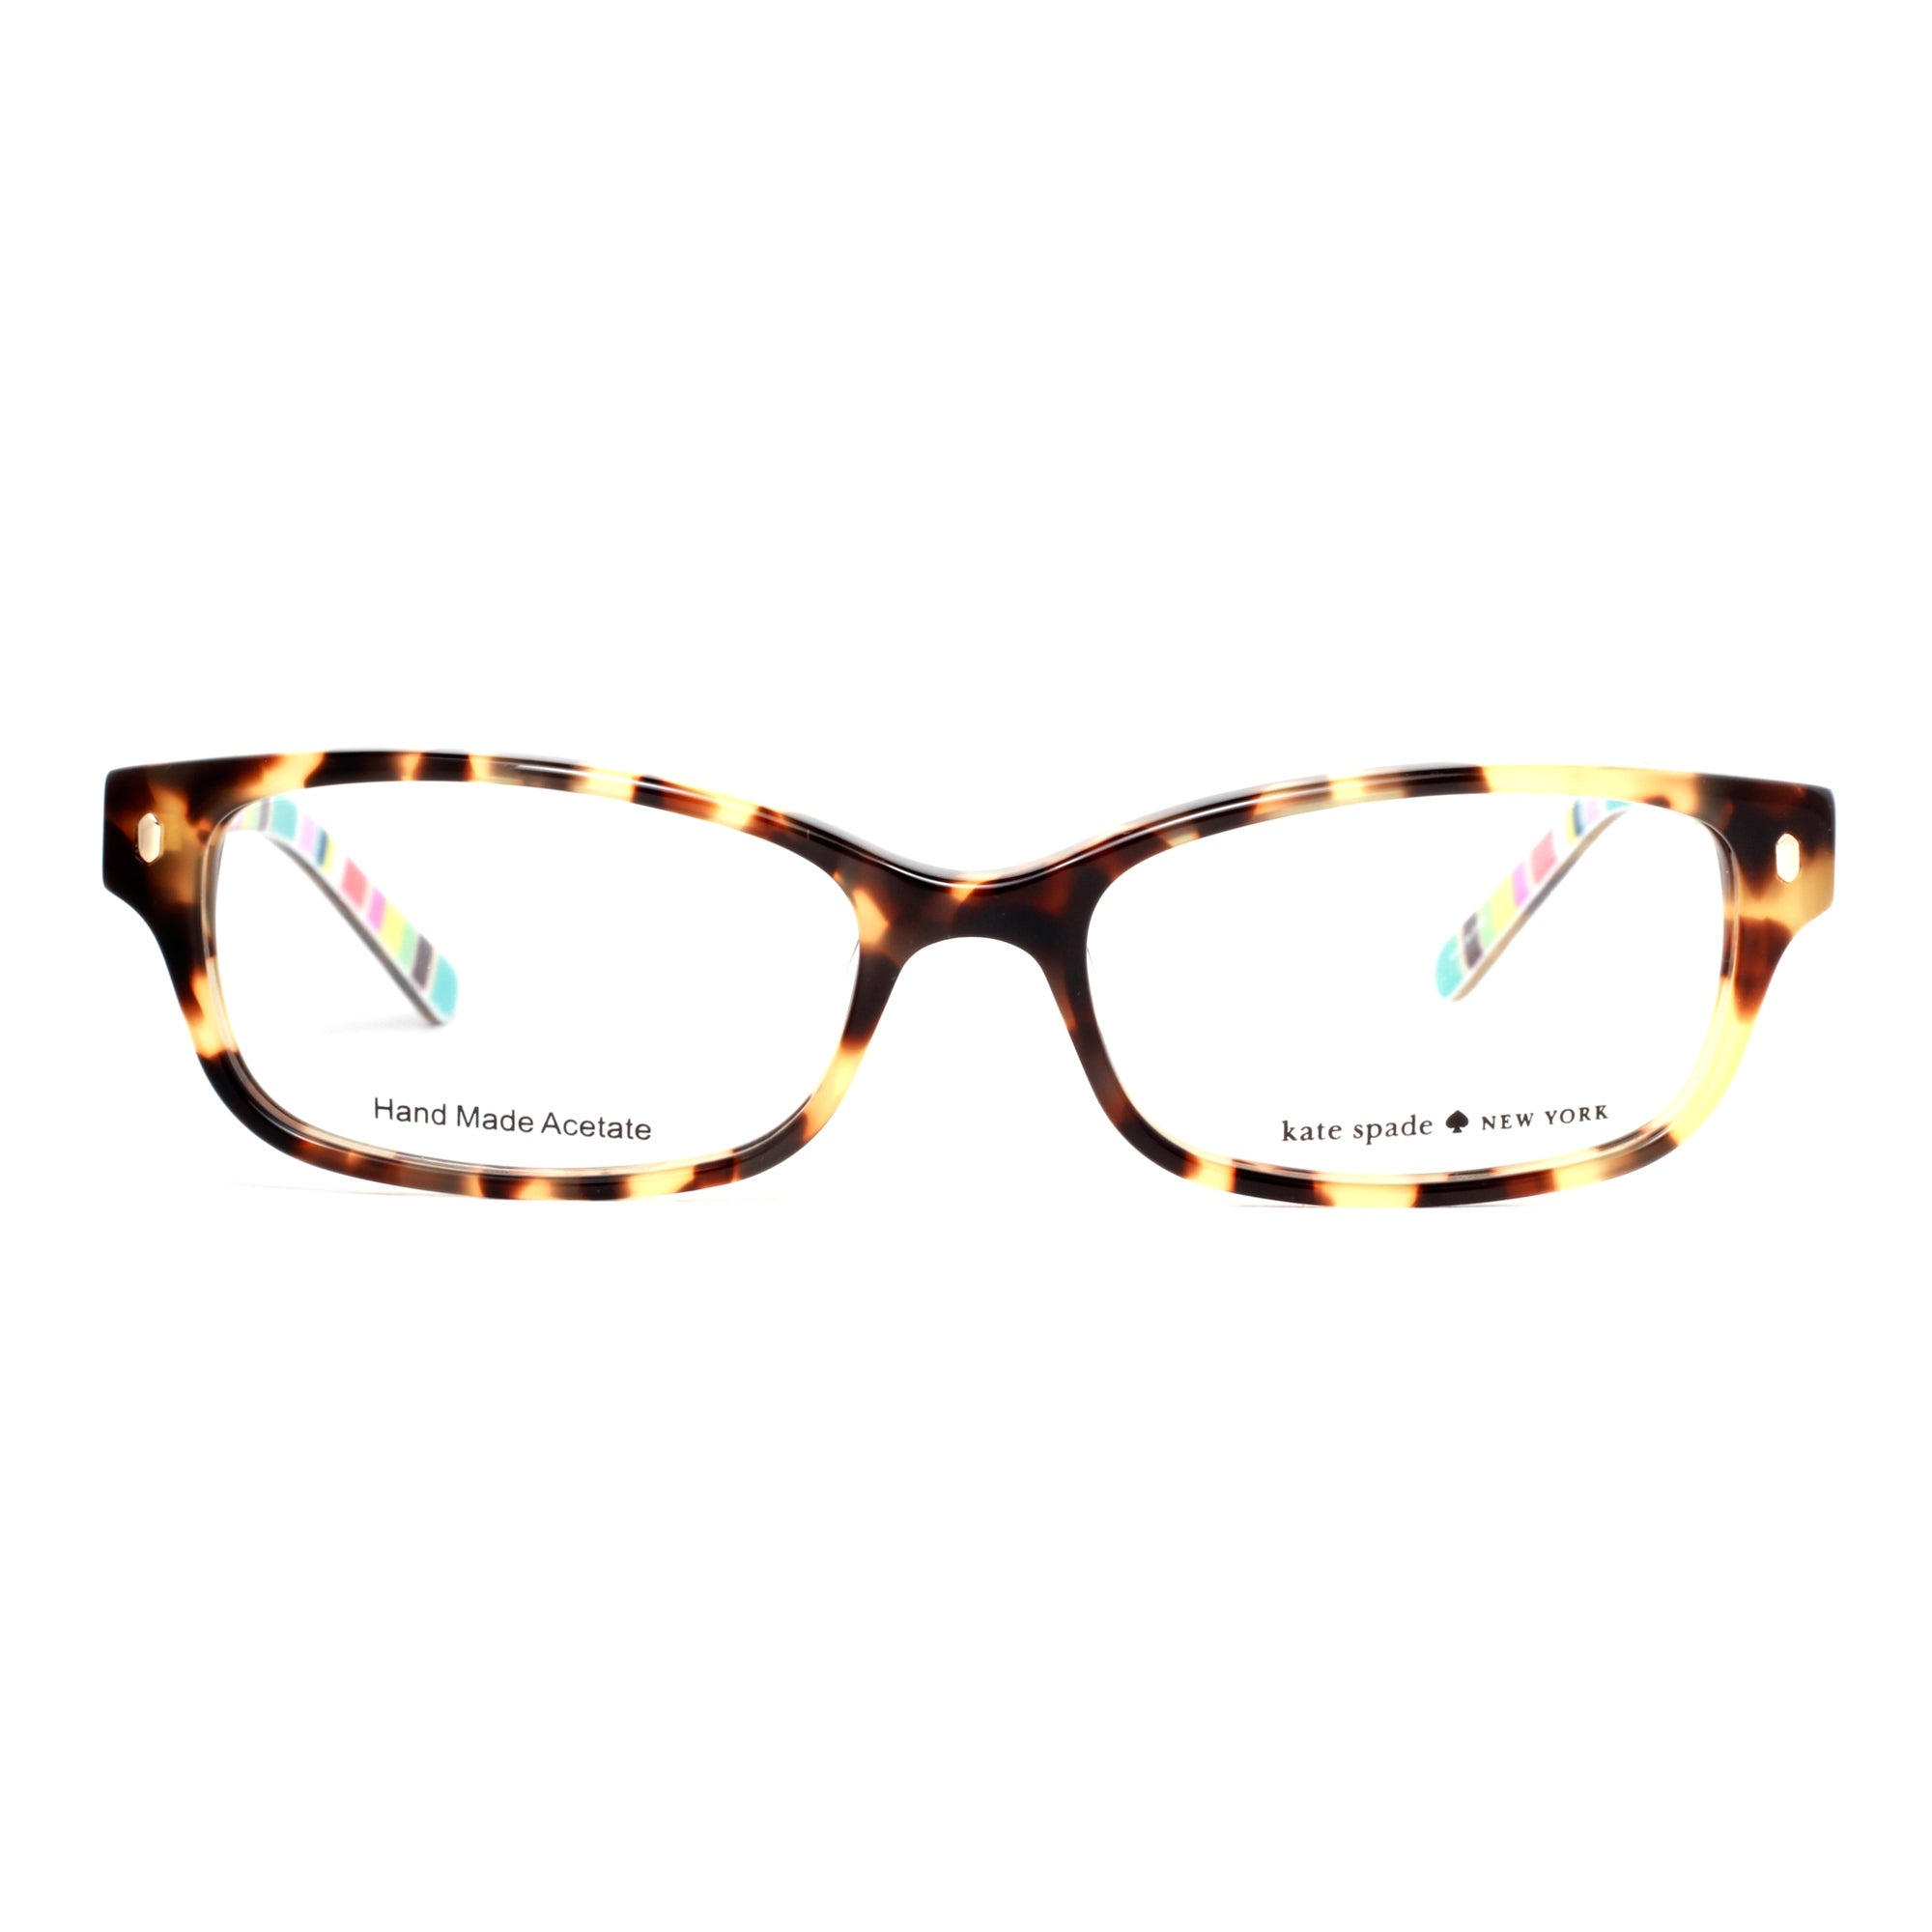 da3ade60b3 Shop Kate Spade Lucyann W40 51mm Tortoise Brown Stripe Women s Rectangular  Eyeglasses - camel tortoise brown - 51mm-16mm-135mm - Free Shipping Today  ...